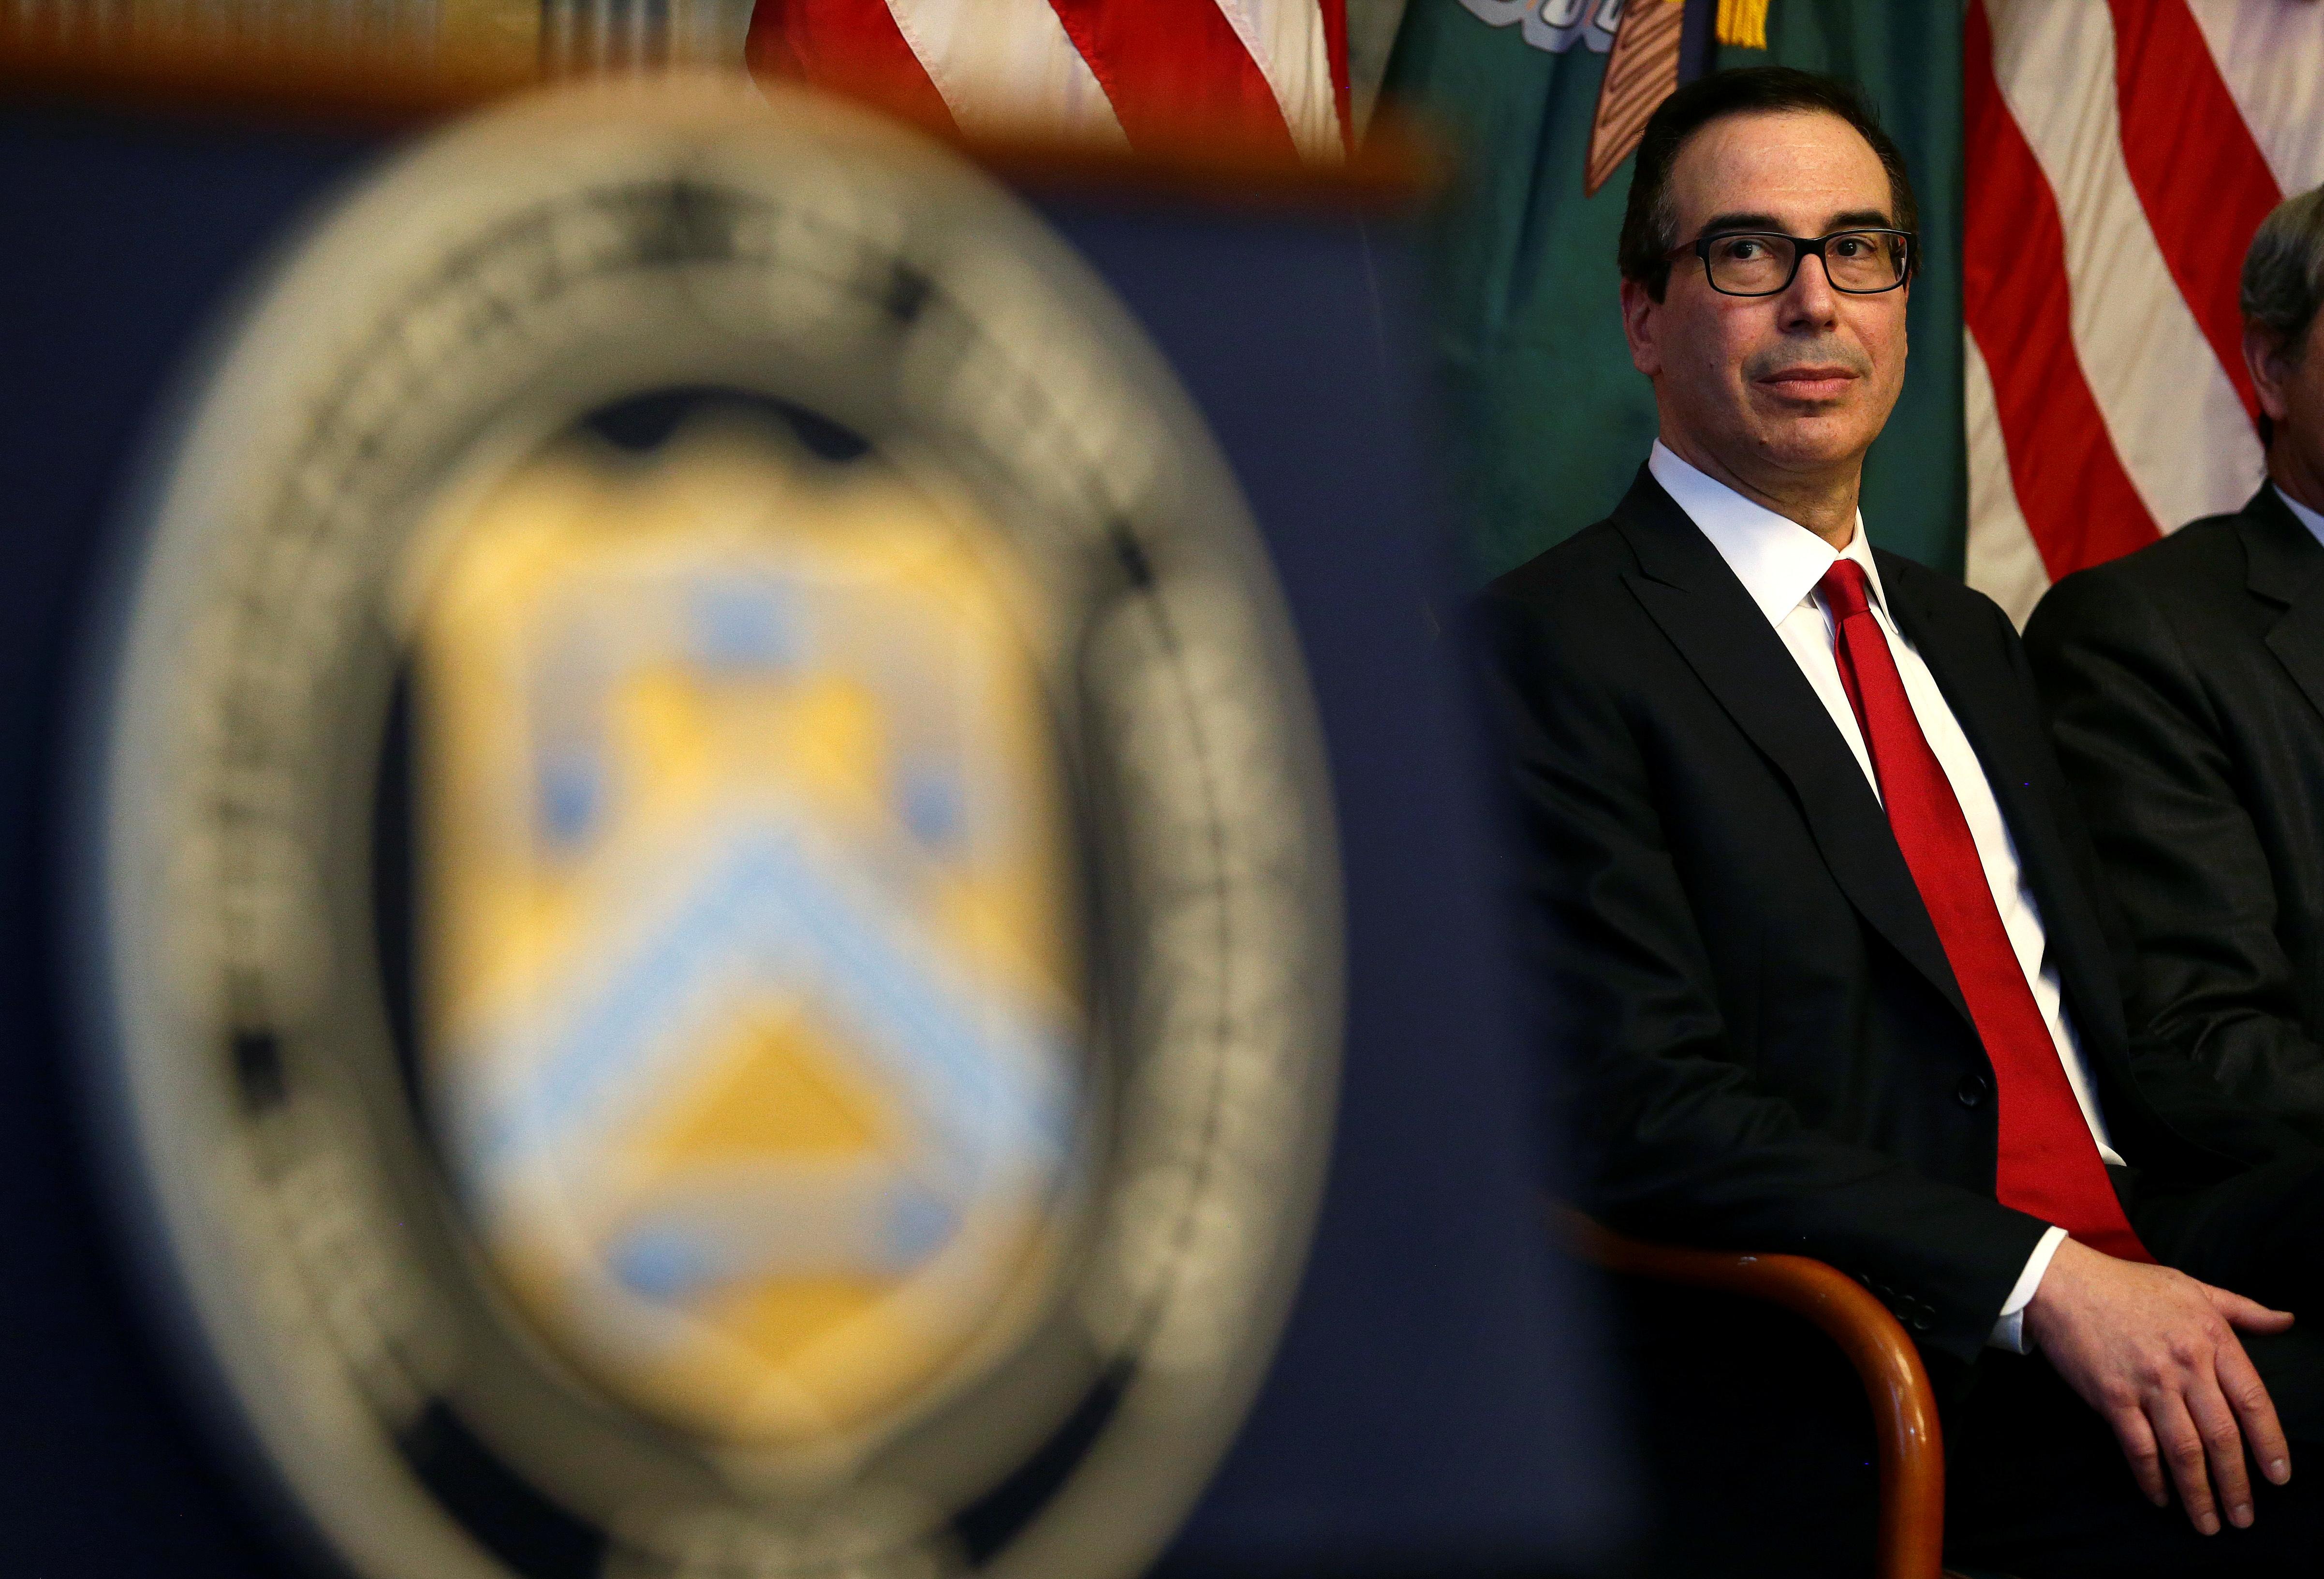 U.S. Secretary of the Treasury Steven Mnuchin sits after swearing-in Joseph M. Otting as Comptroller of the Currency in Washington, U.S., November 27, 2017.   REUTERS/Joshua Roberts - RC1487FF4710